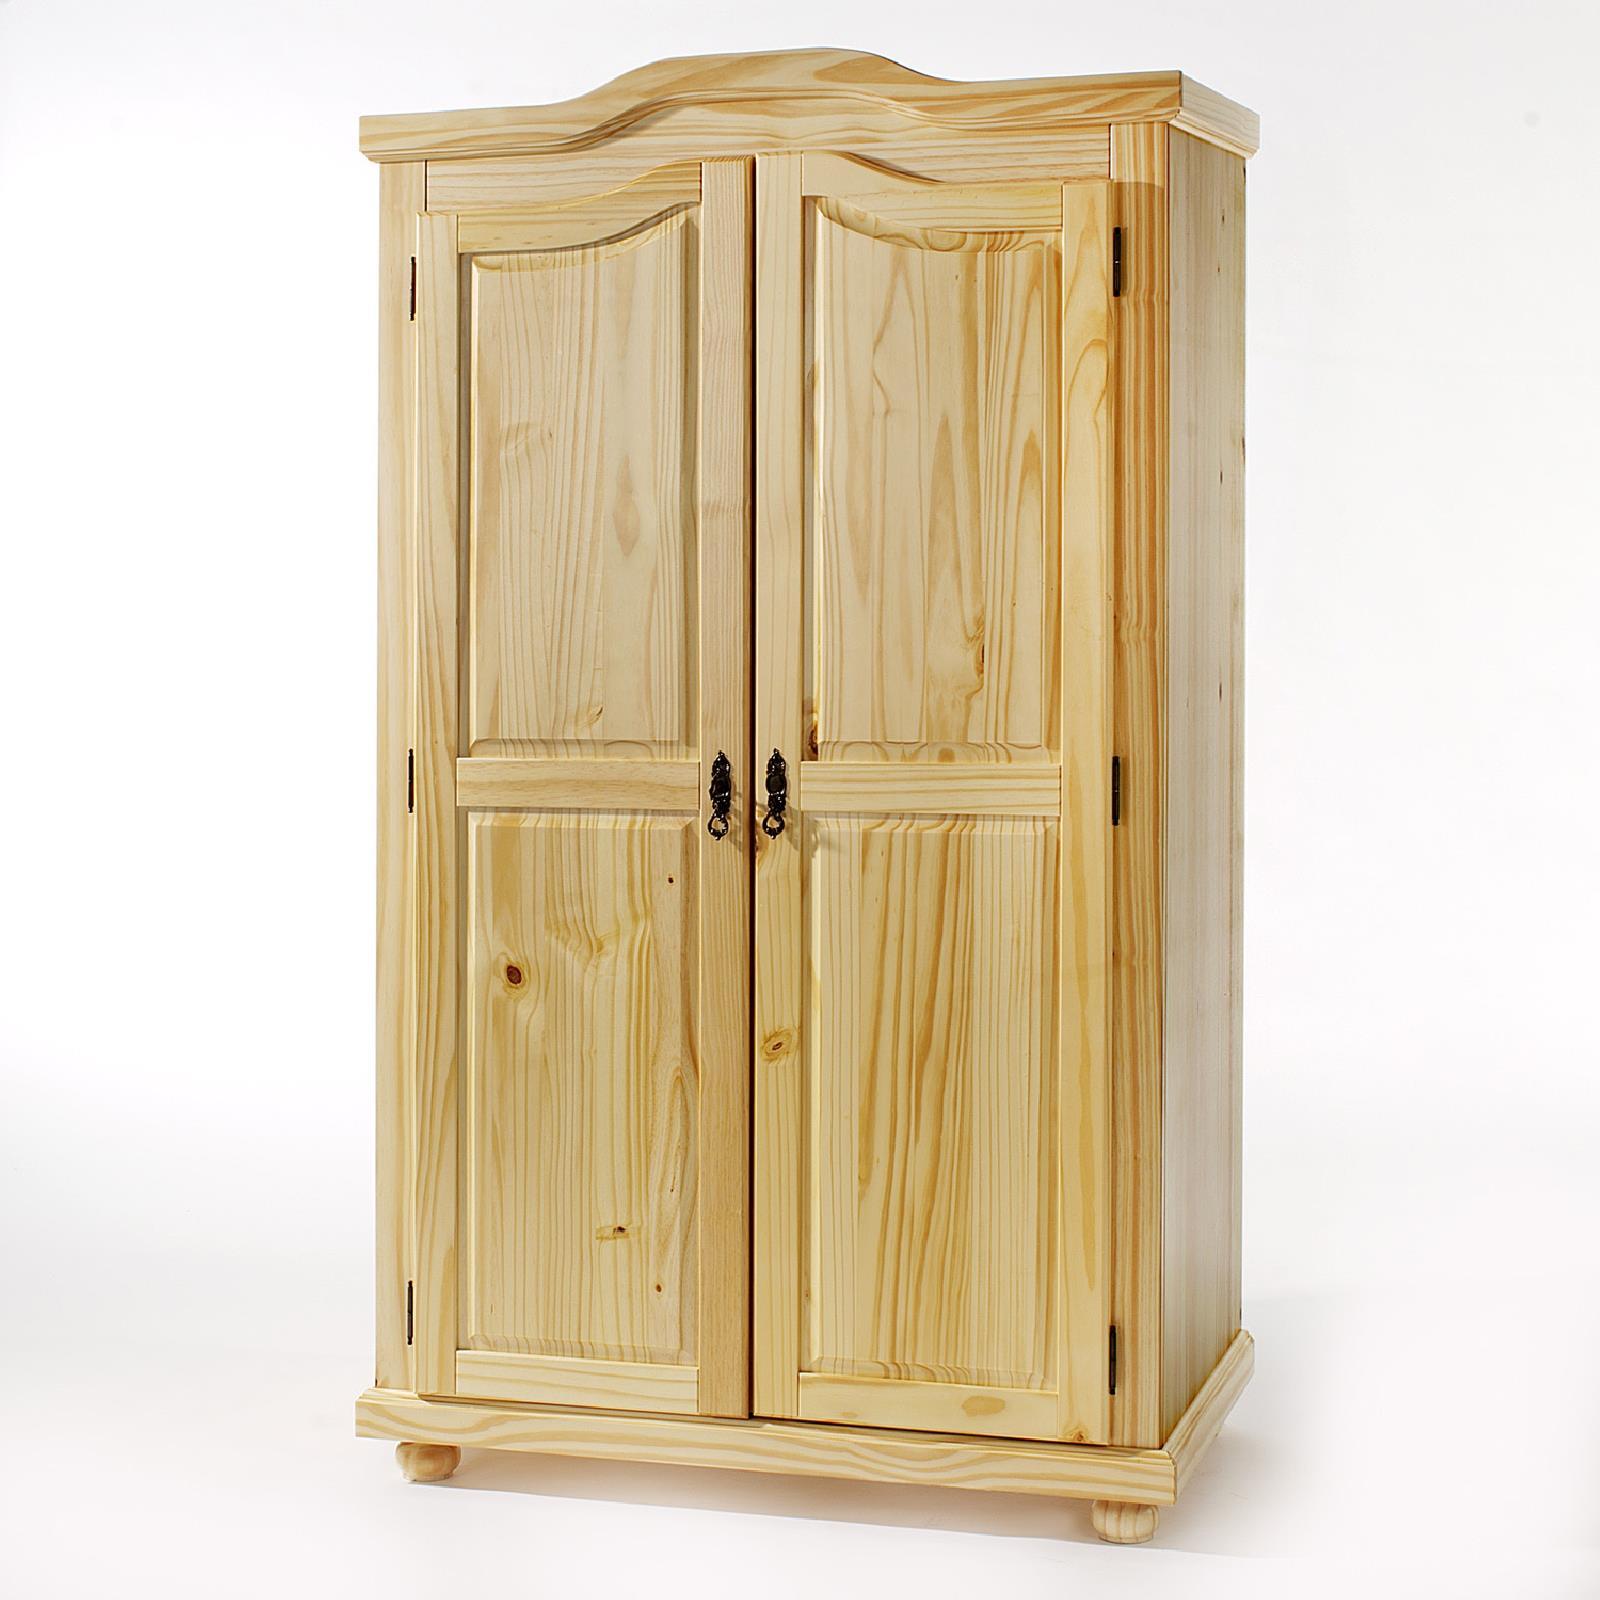 kleiderschrank aus kiefer in natur lackiert caro m bel. Black Bedroom Furniture Sets. Home Design Ideas